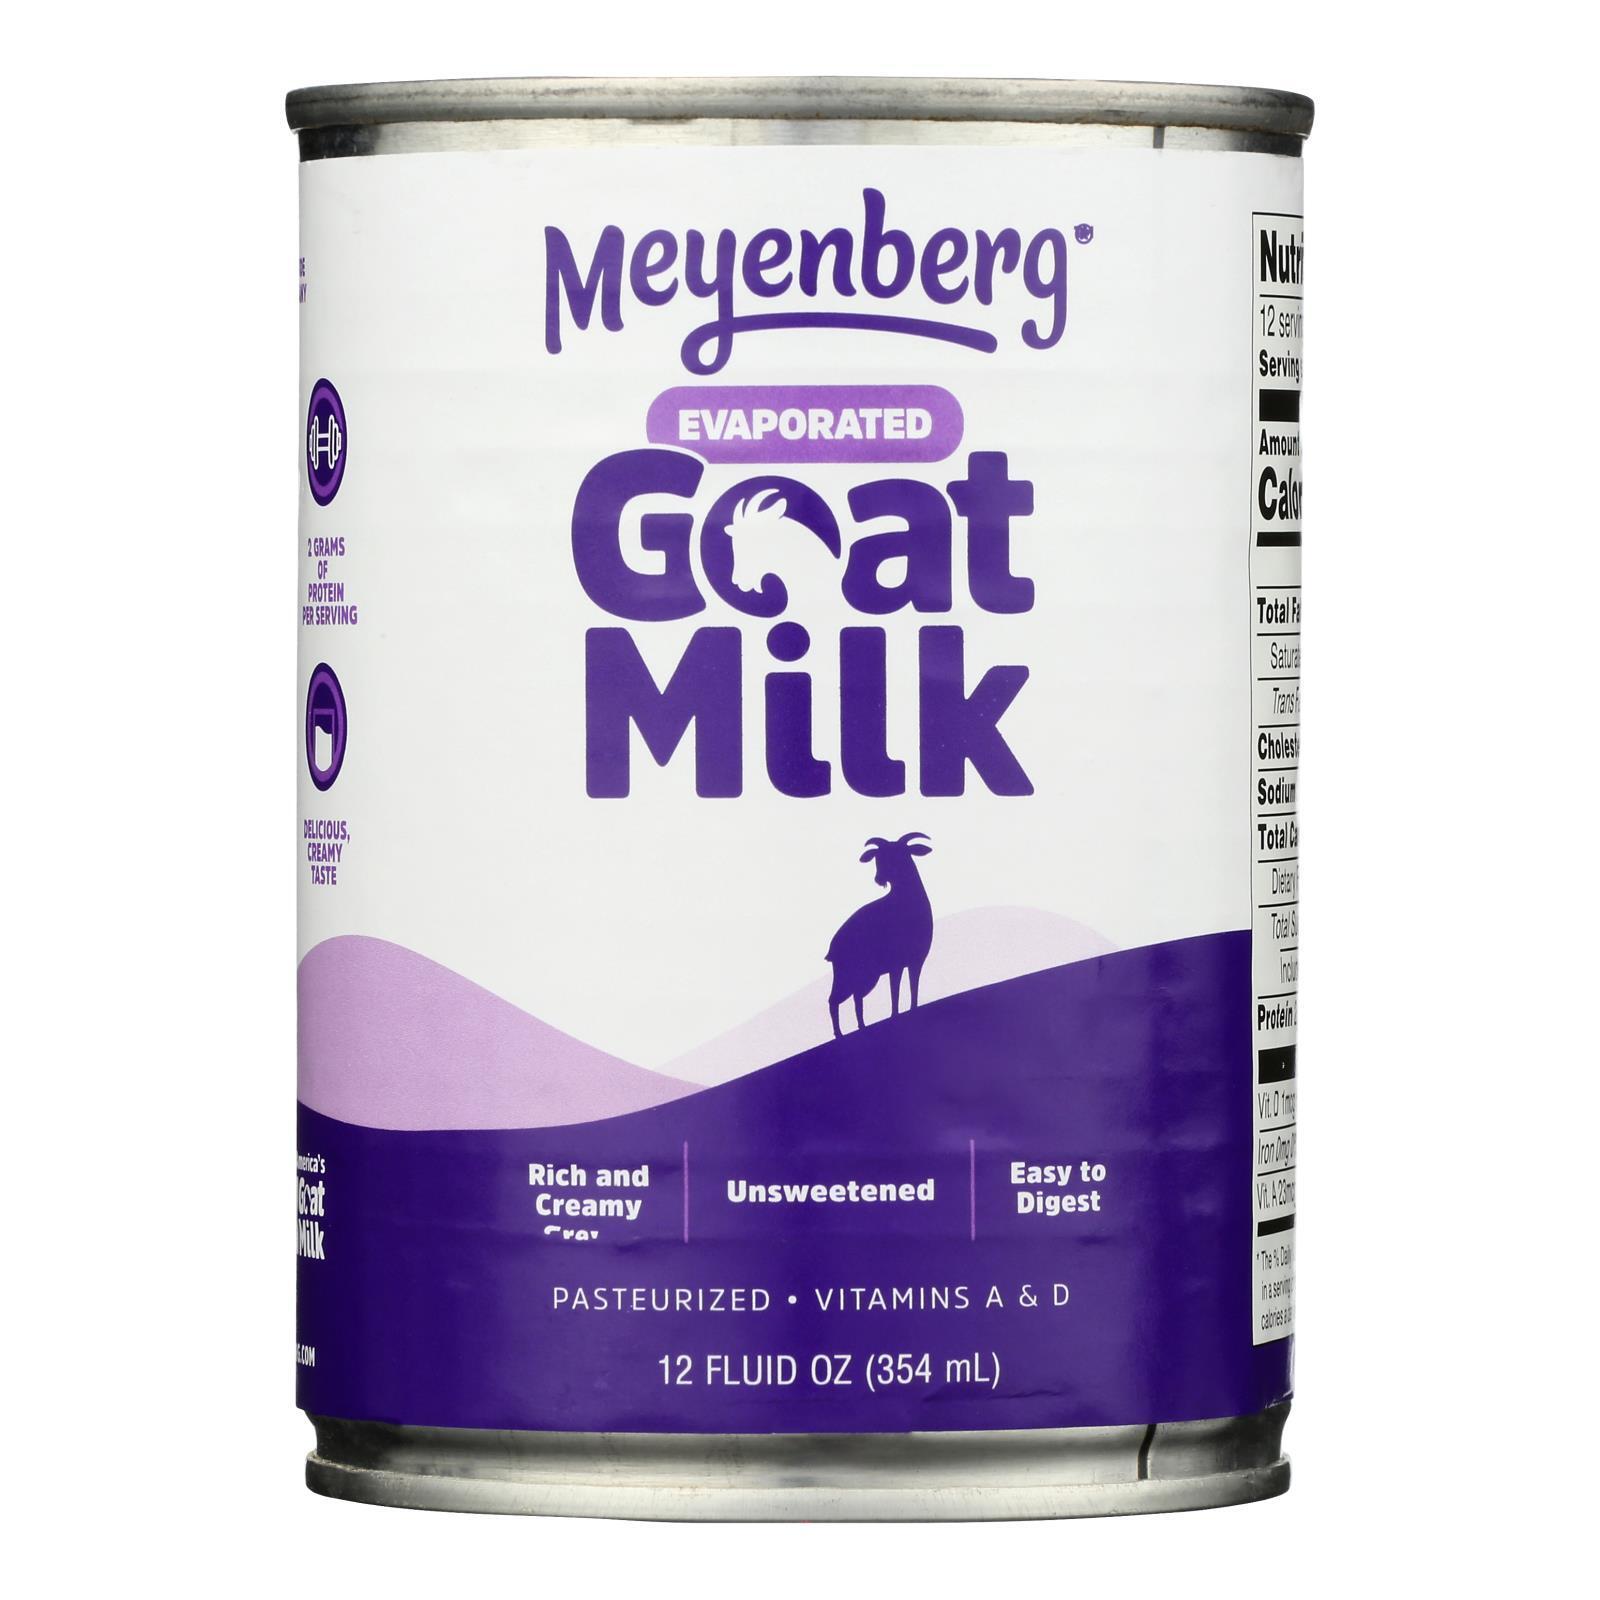 Meyenberg Evaporated Goat Milk - Case of 12 - 12 Fl oz.